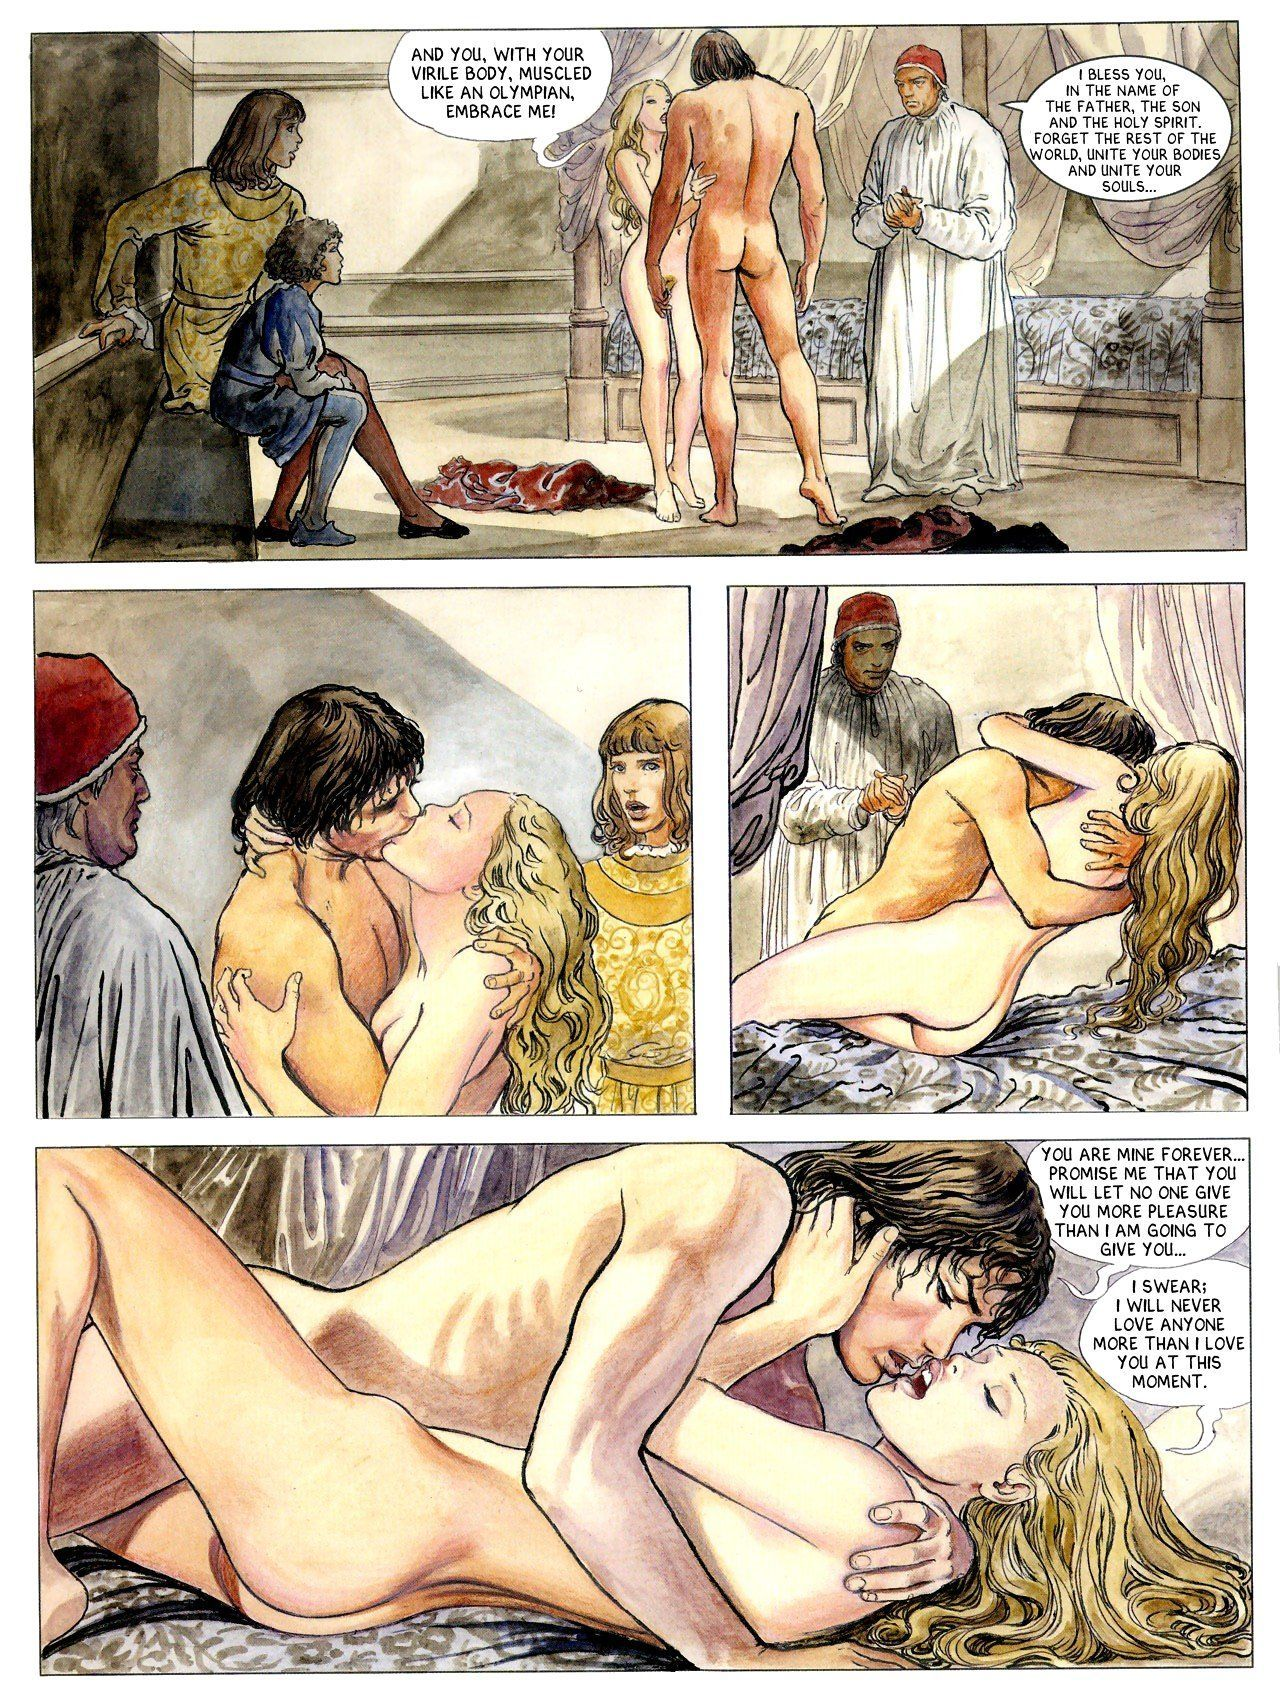 knigi-pro-erotiku-i-seks